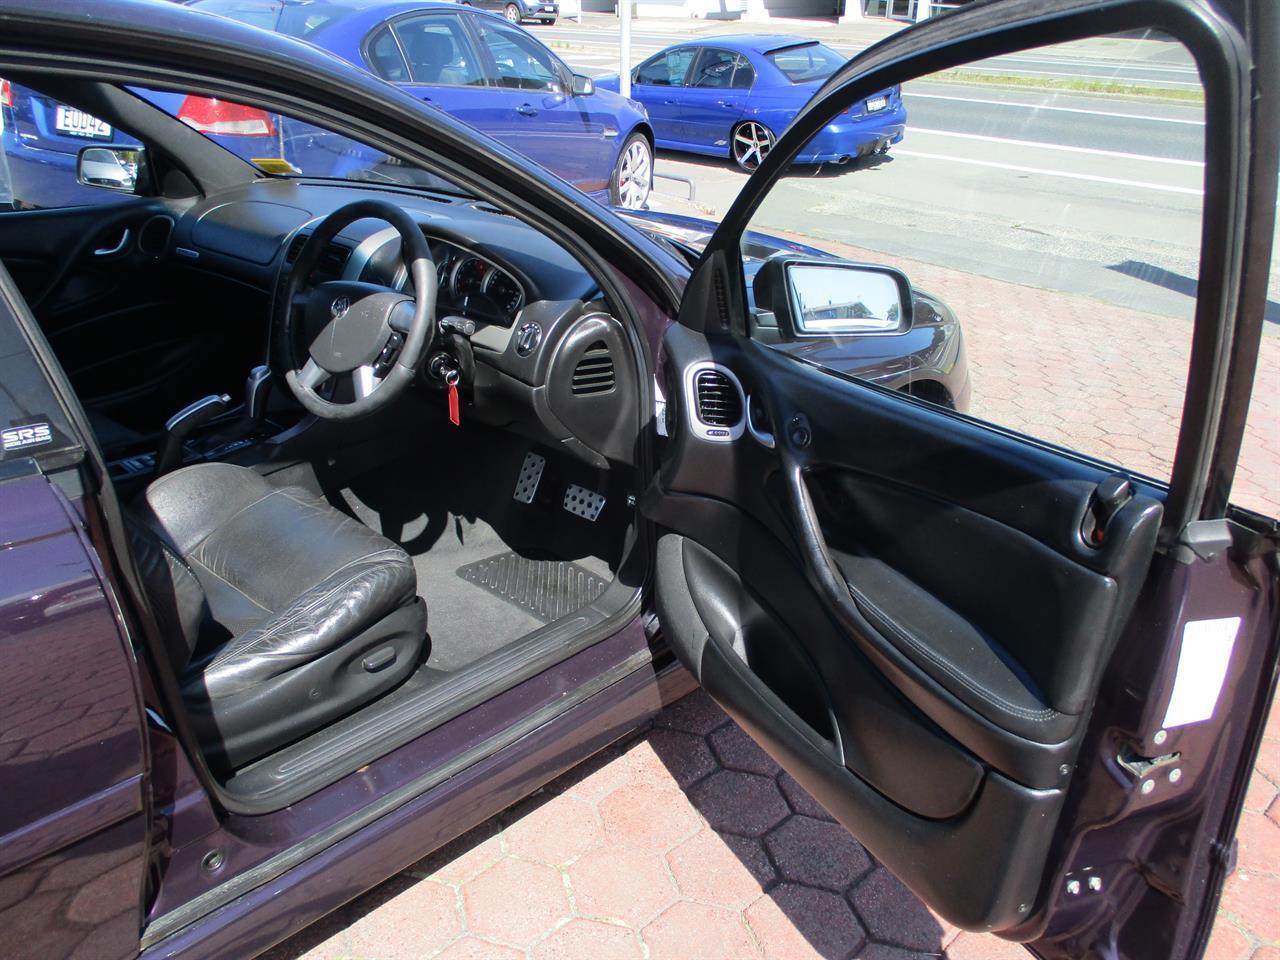 image-15, 2004 Holden Commodore SS AUTO V8 at Dunedin